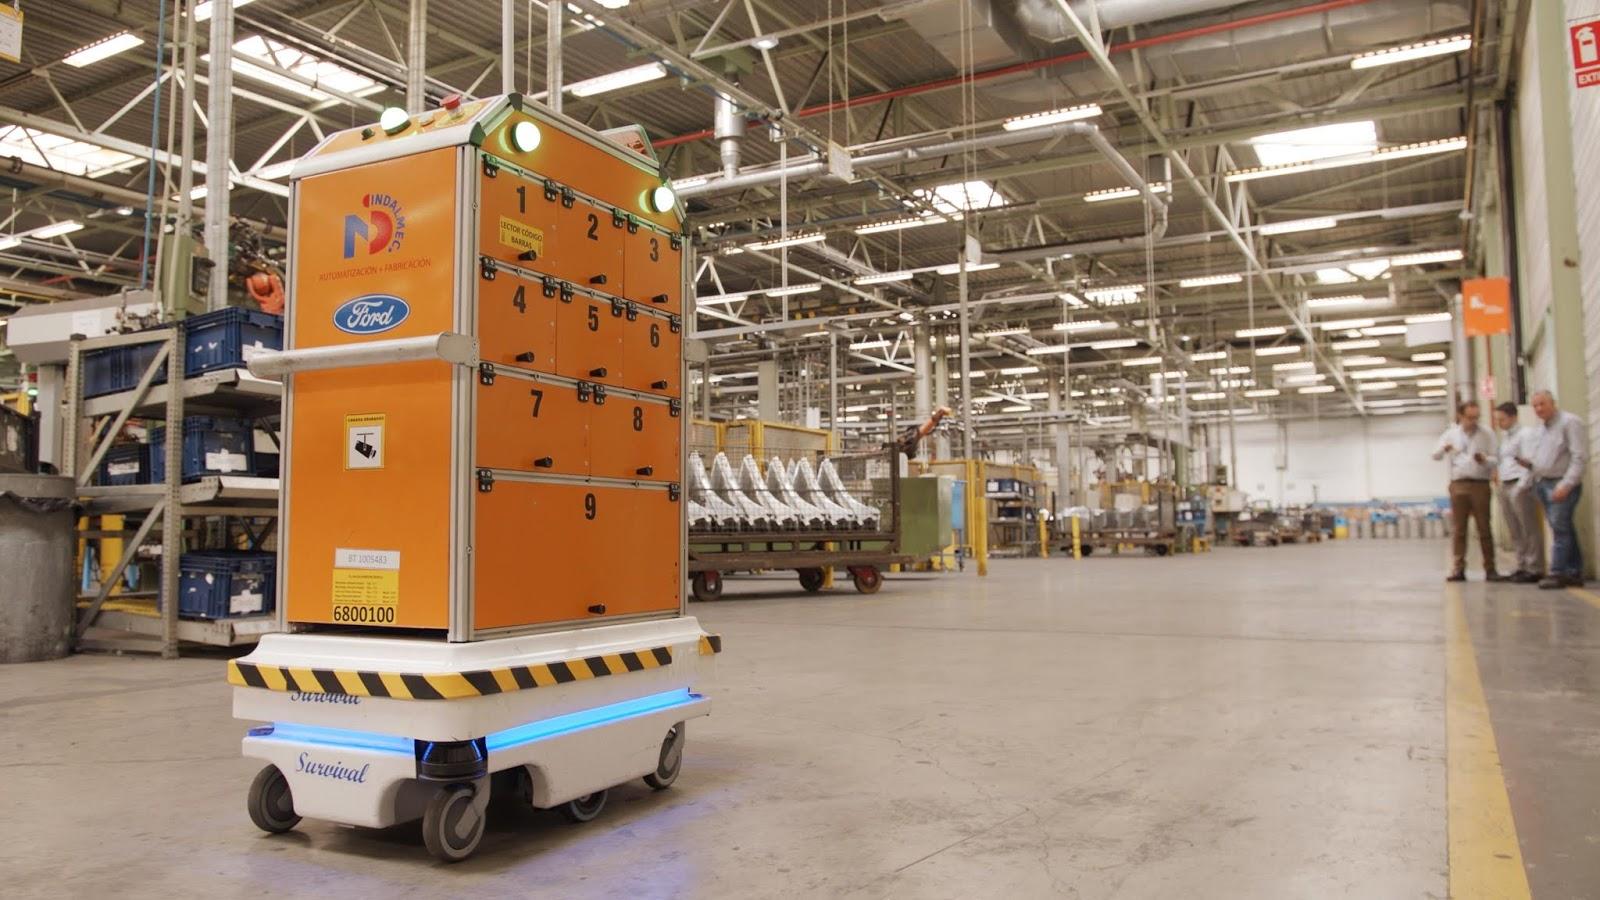 Ford SelfDrivingRobot 2 Η Ford έφτιαξε ένα ρομπότ για τις χαμαλοδουλειές του εργοστασίου της! Ford, video, videos, Εργοστάσιο, Τεχνολογία